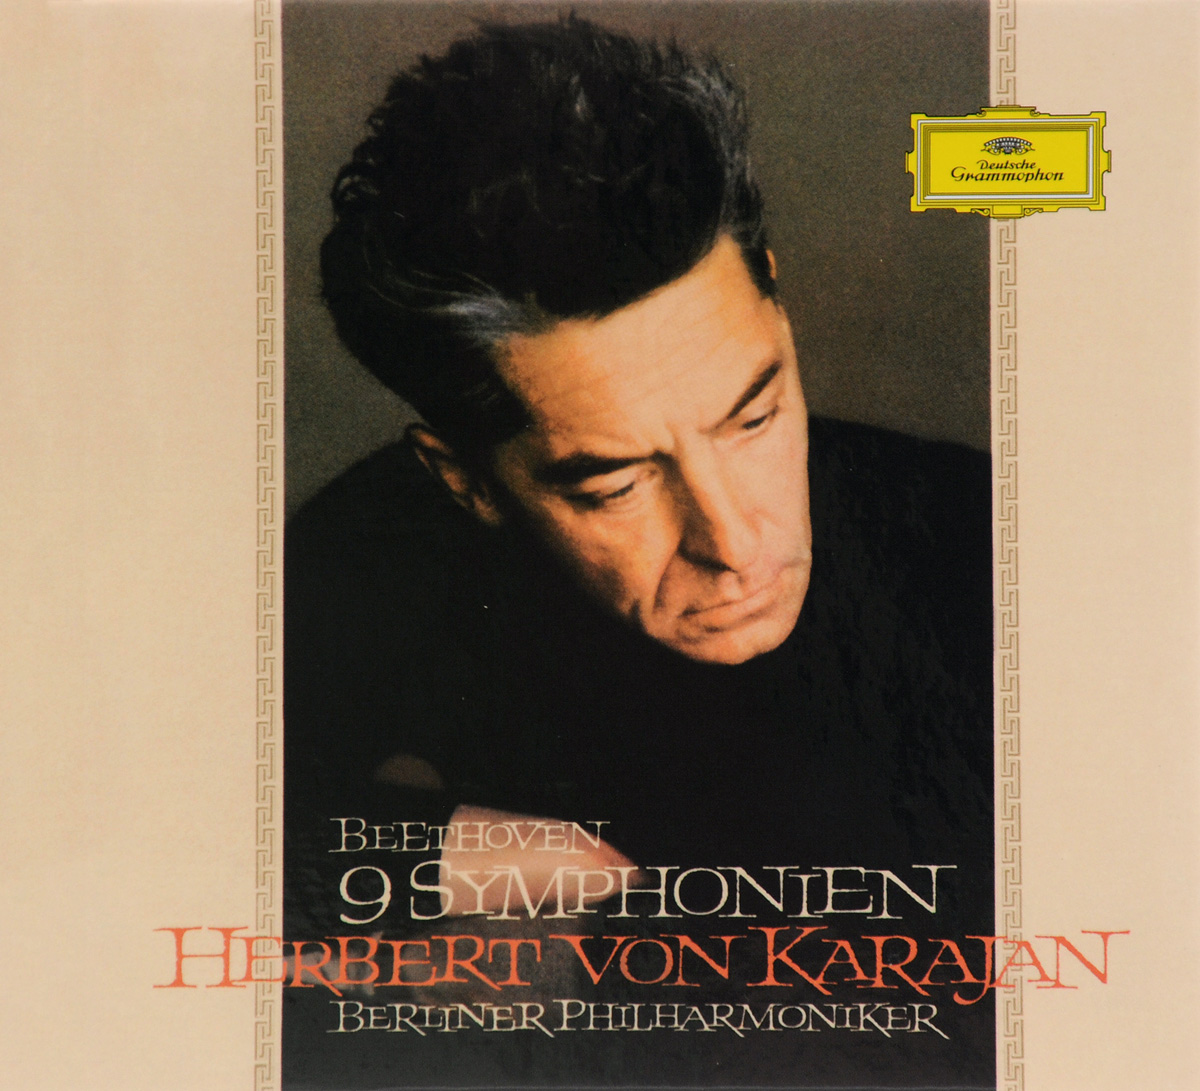 лучшая цена Герберт Караян,Berliner Philharmoniker Herbert Von Karajan, Berliner Philharmoniker. Beethoven. 9 Symphonien